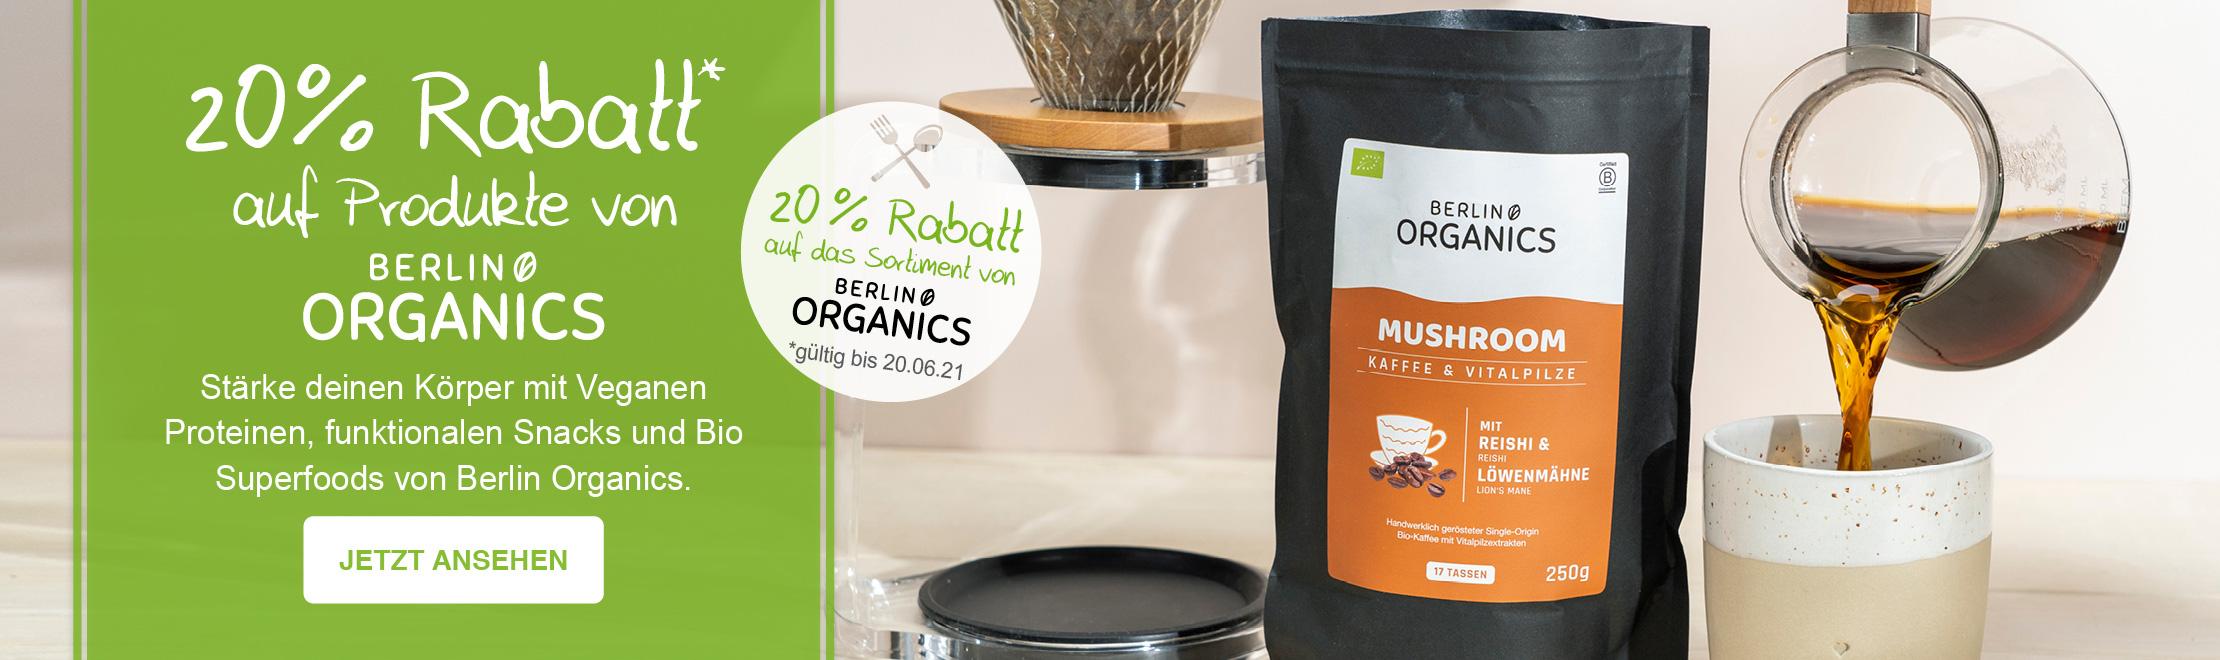 20% Berlin Organics